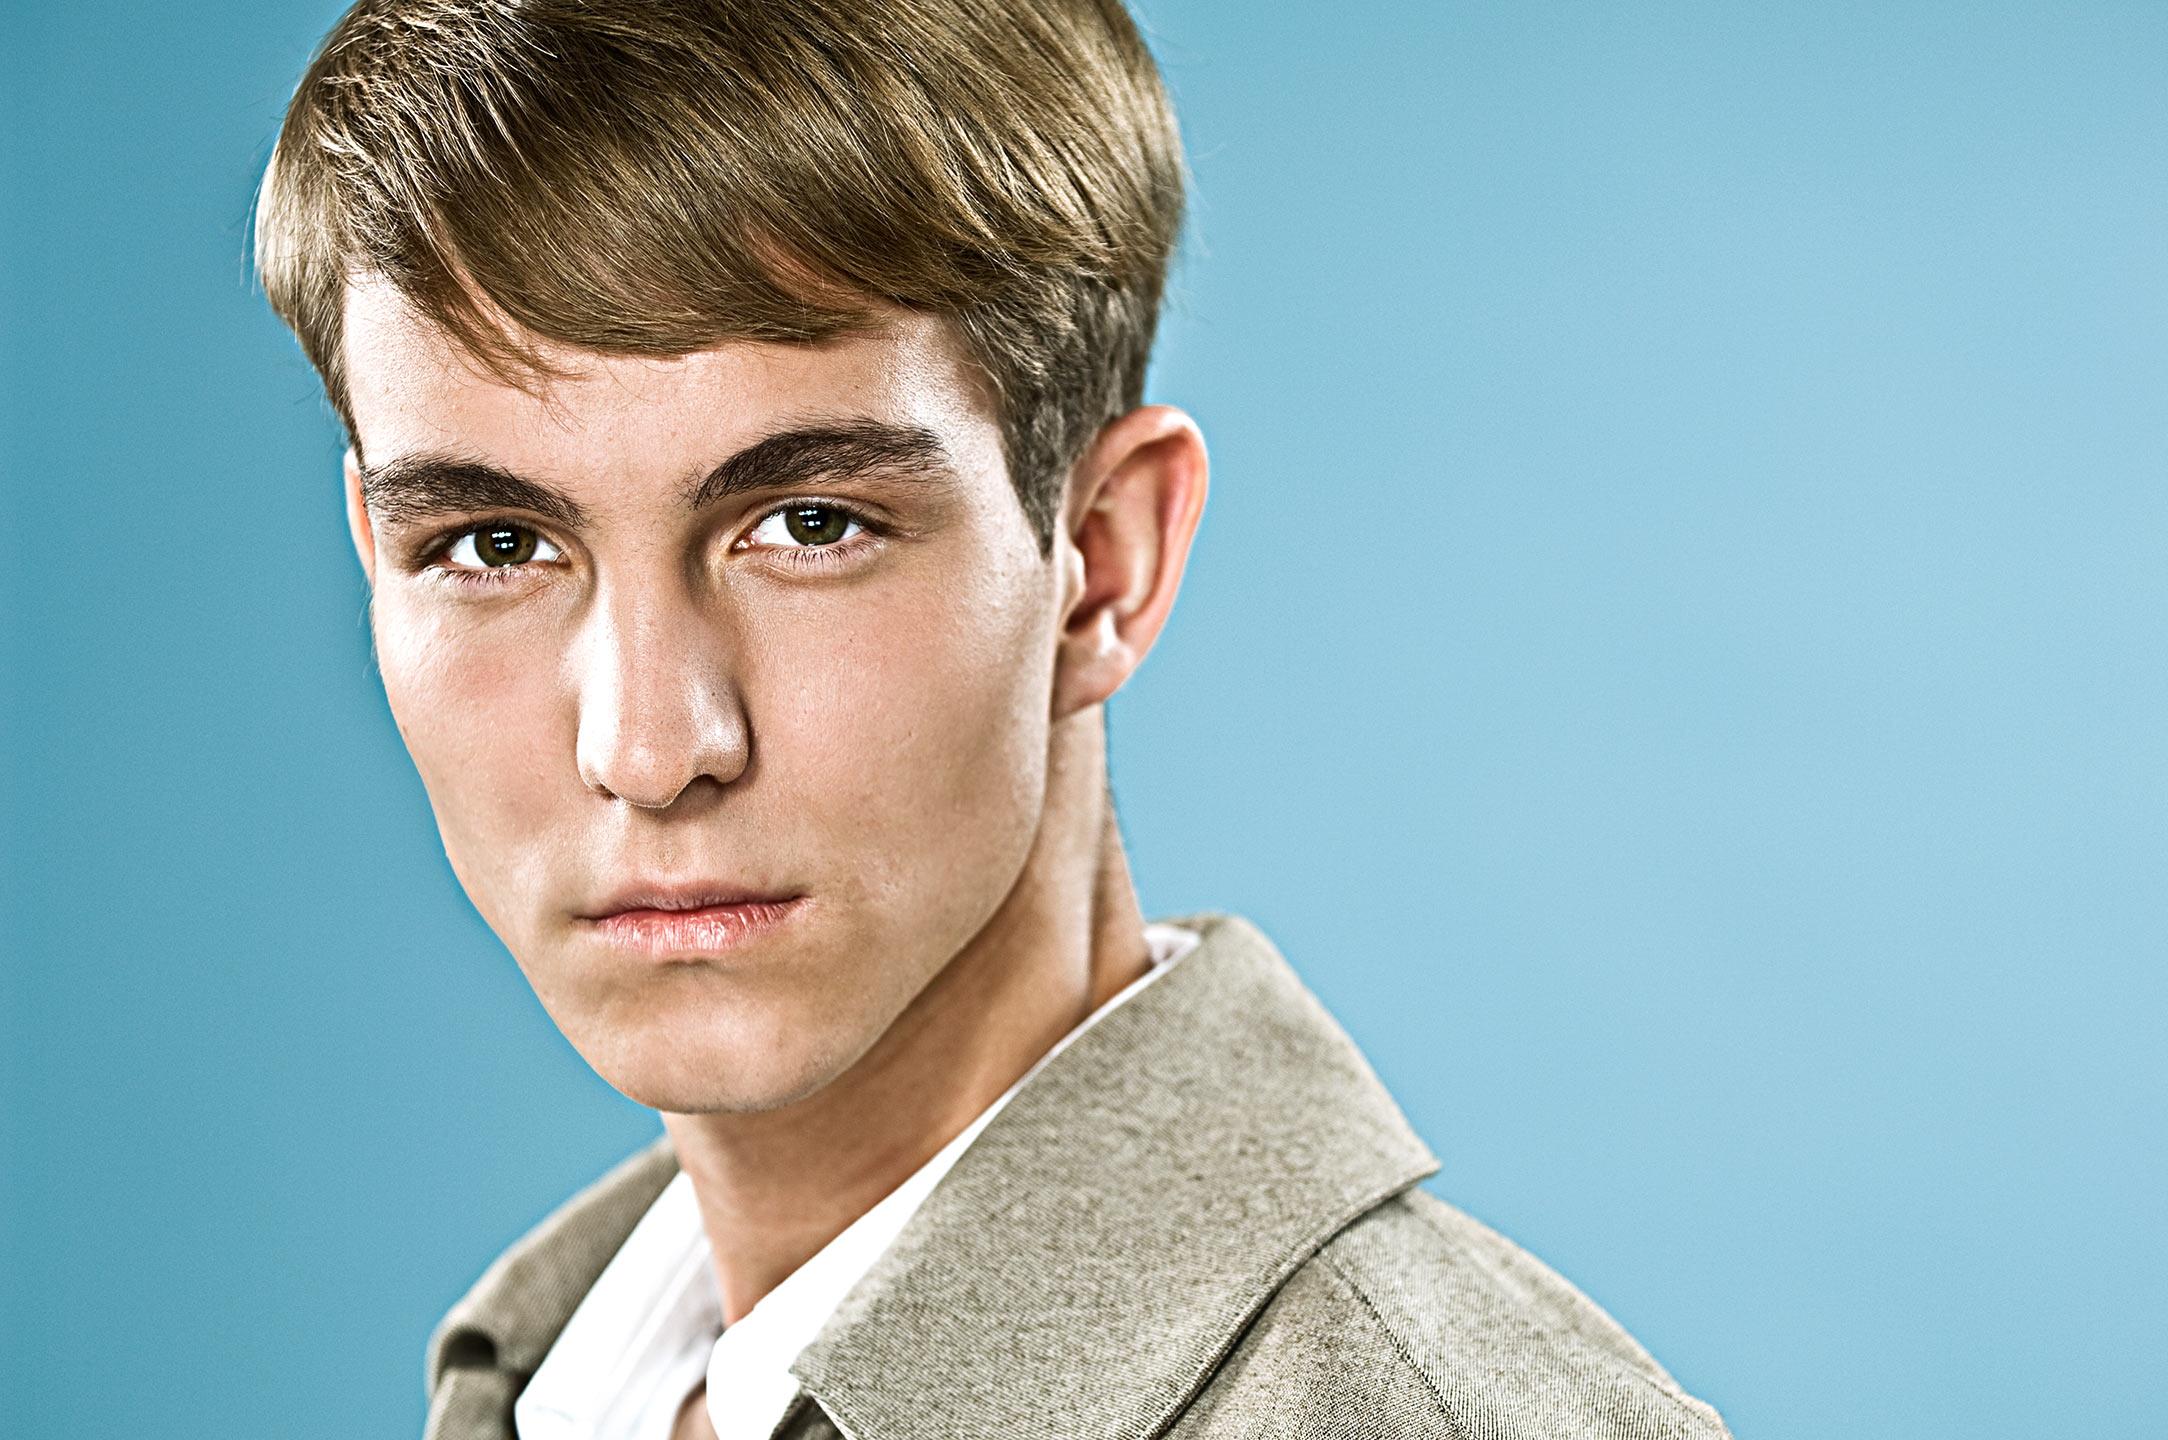 Dean Northcott - portrait of teenager